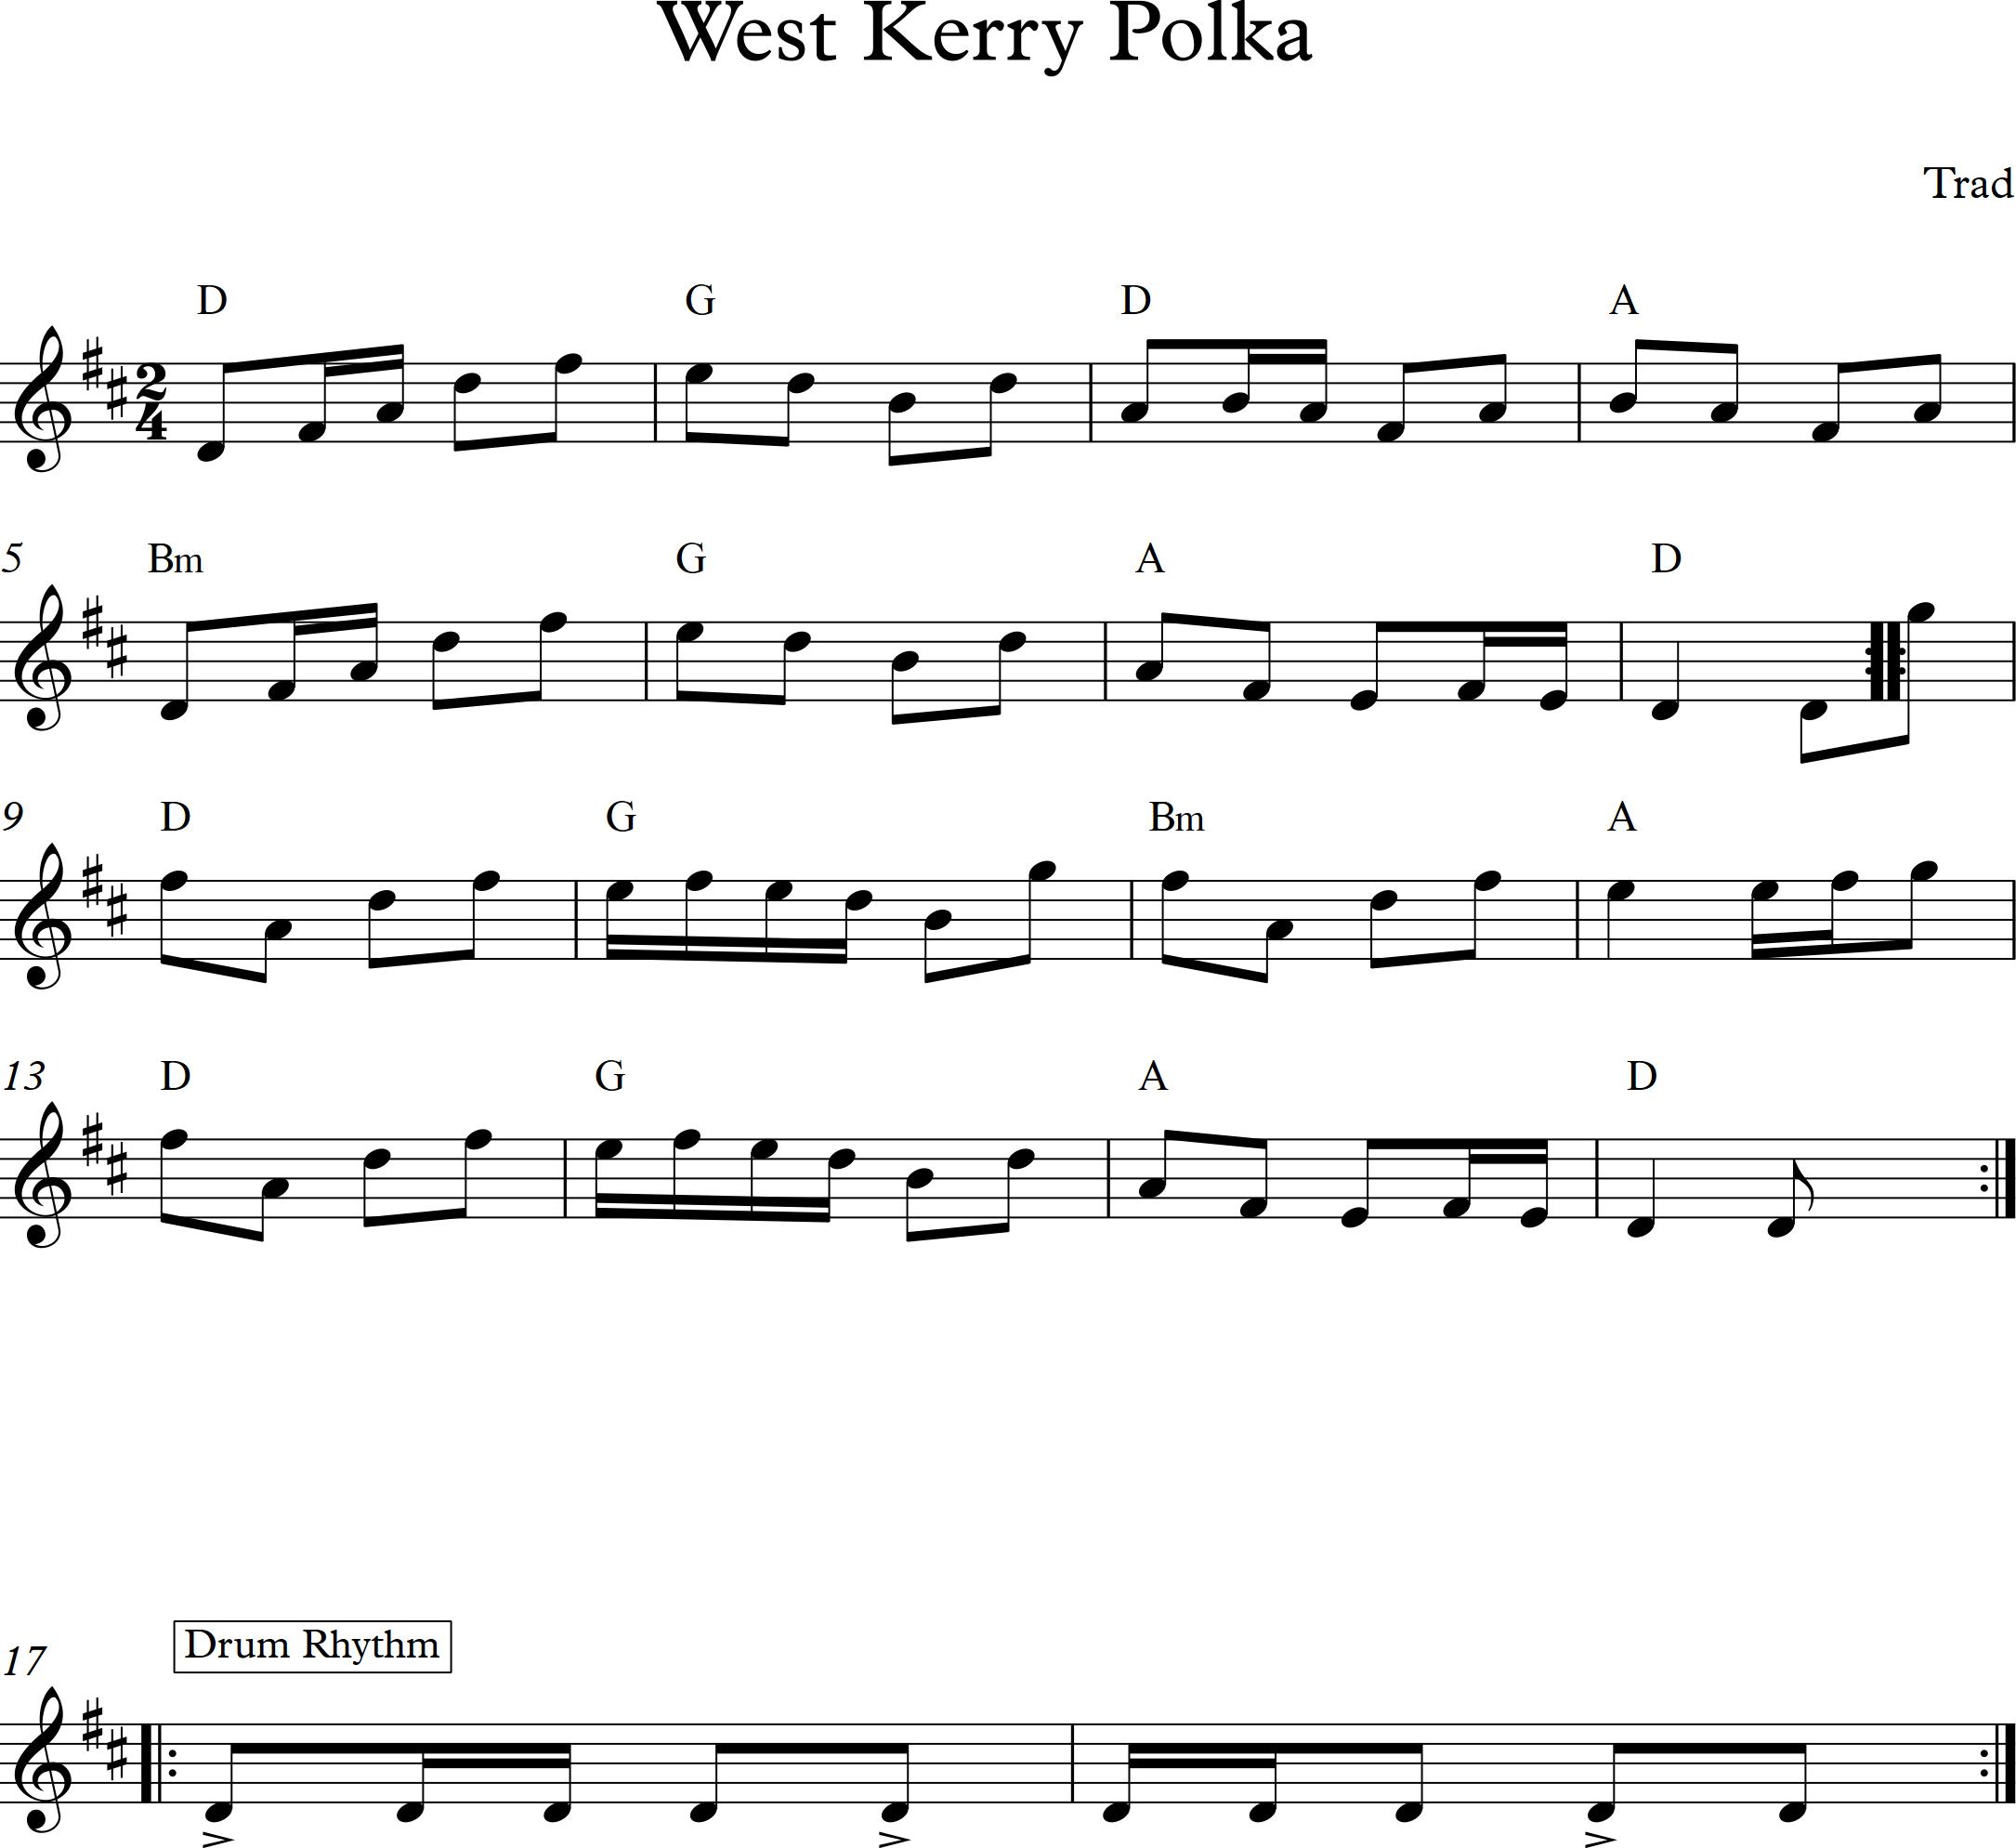 West Kerry Polka